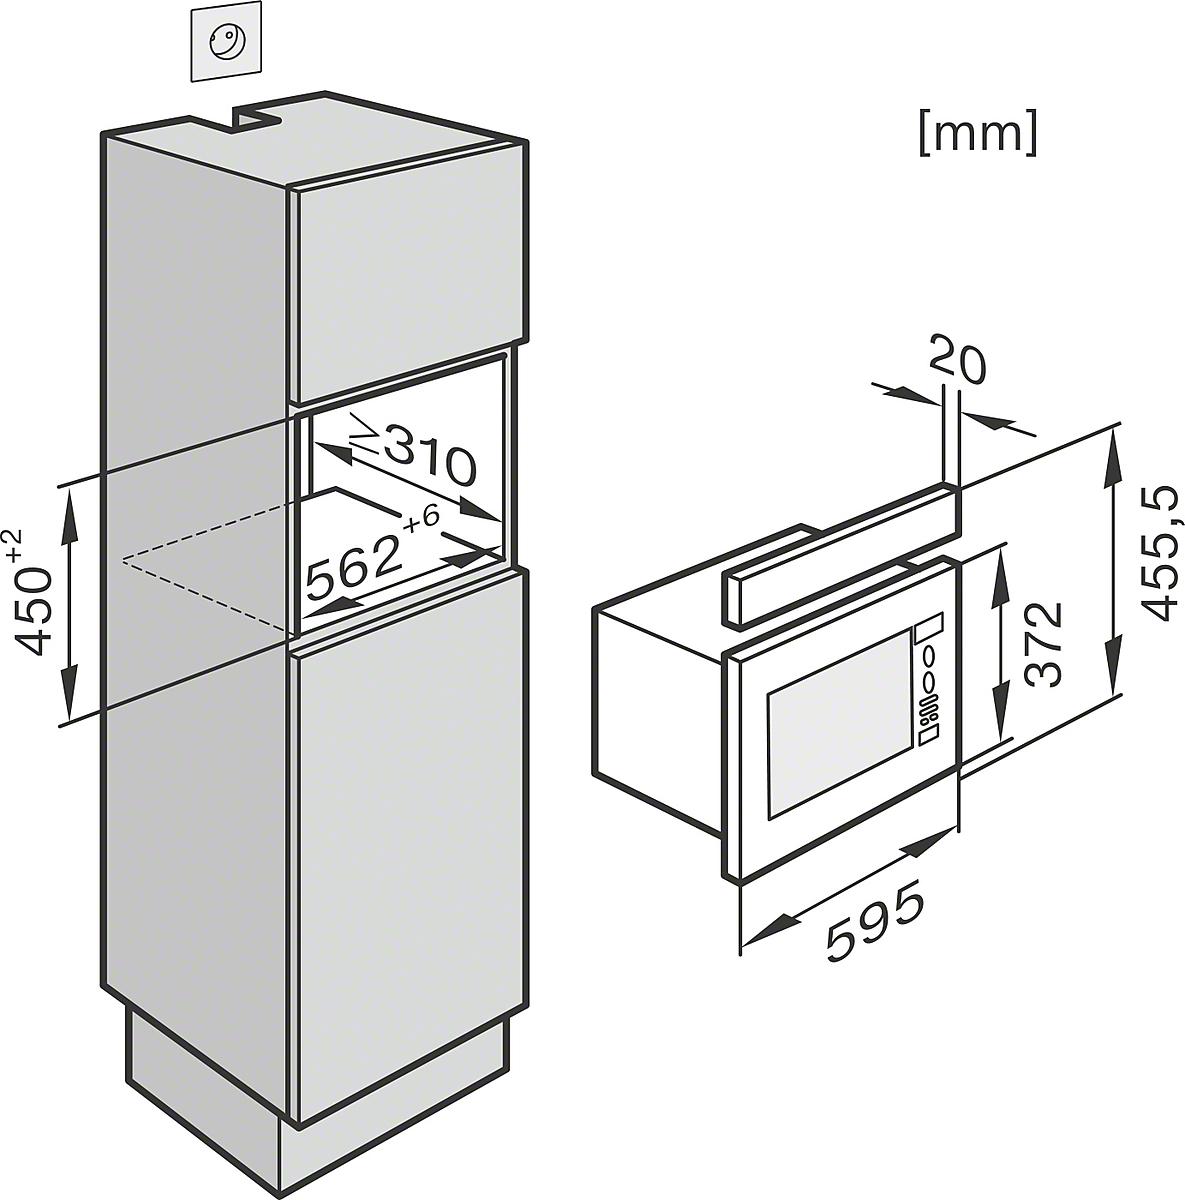 miele micro ondas m 6032 sc micro ondas de encastrar. Black Bedroom Furniture Sets. Home Design Ideas